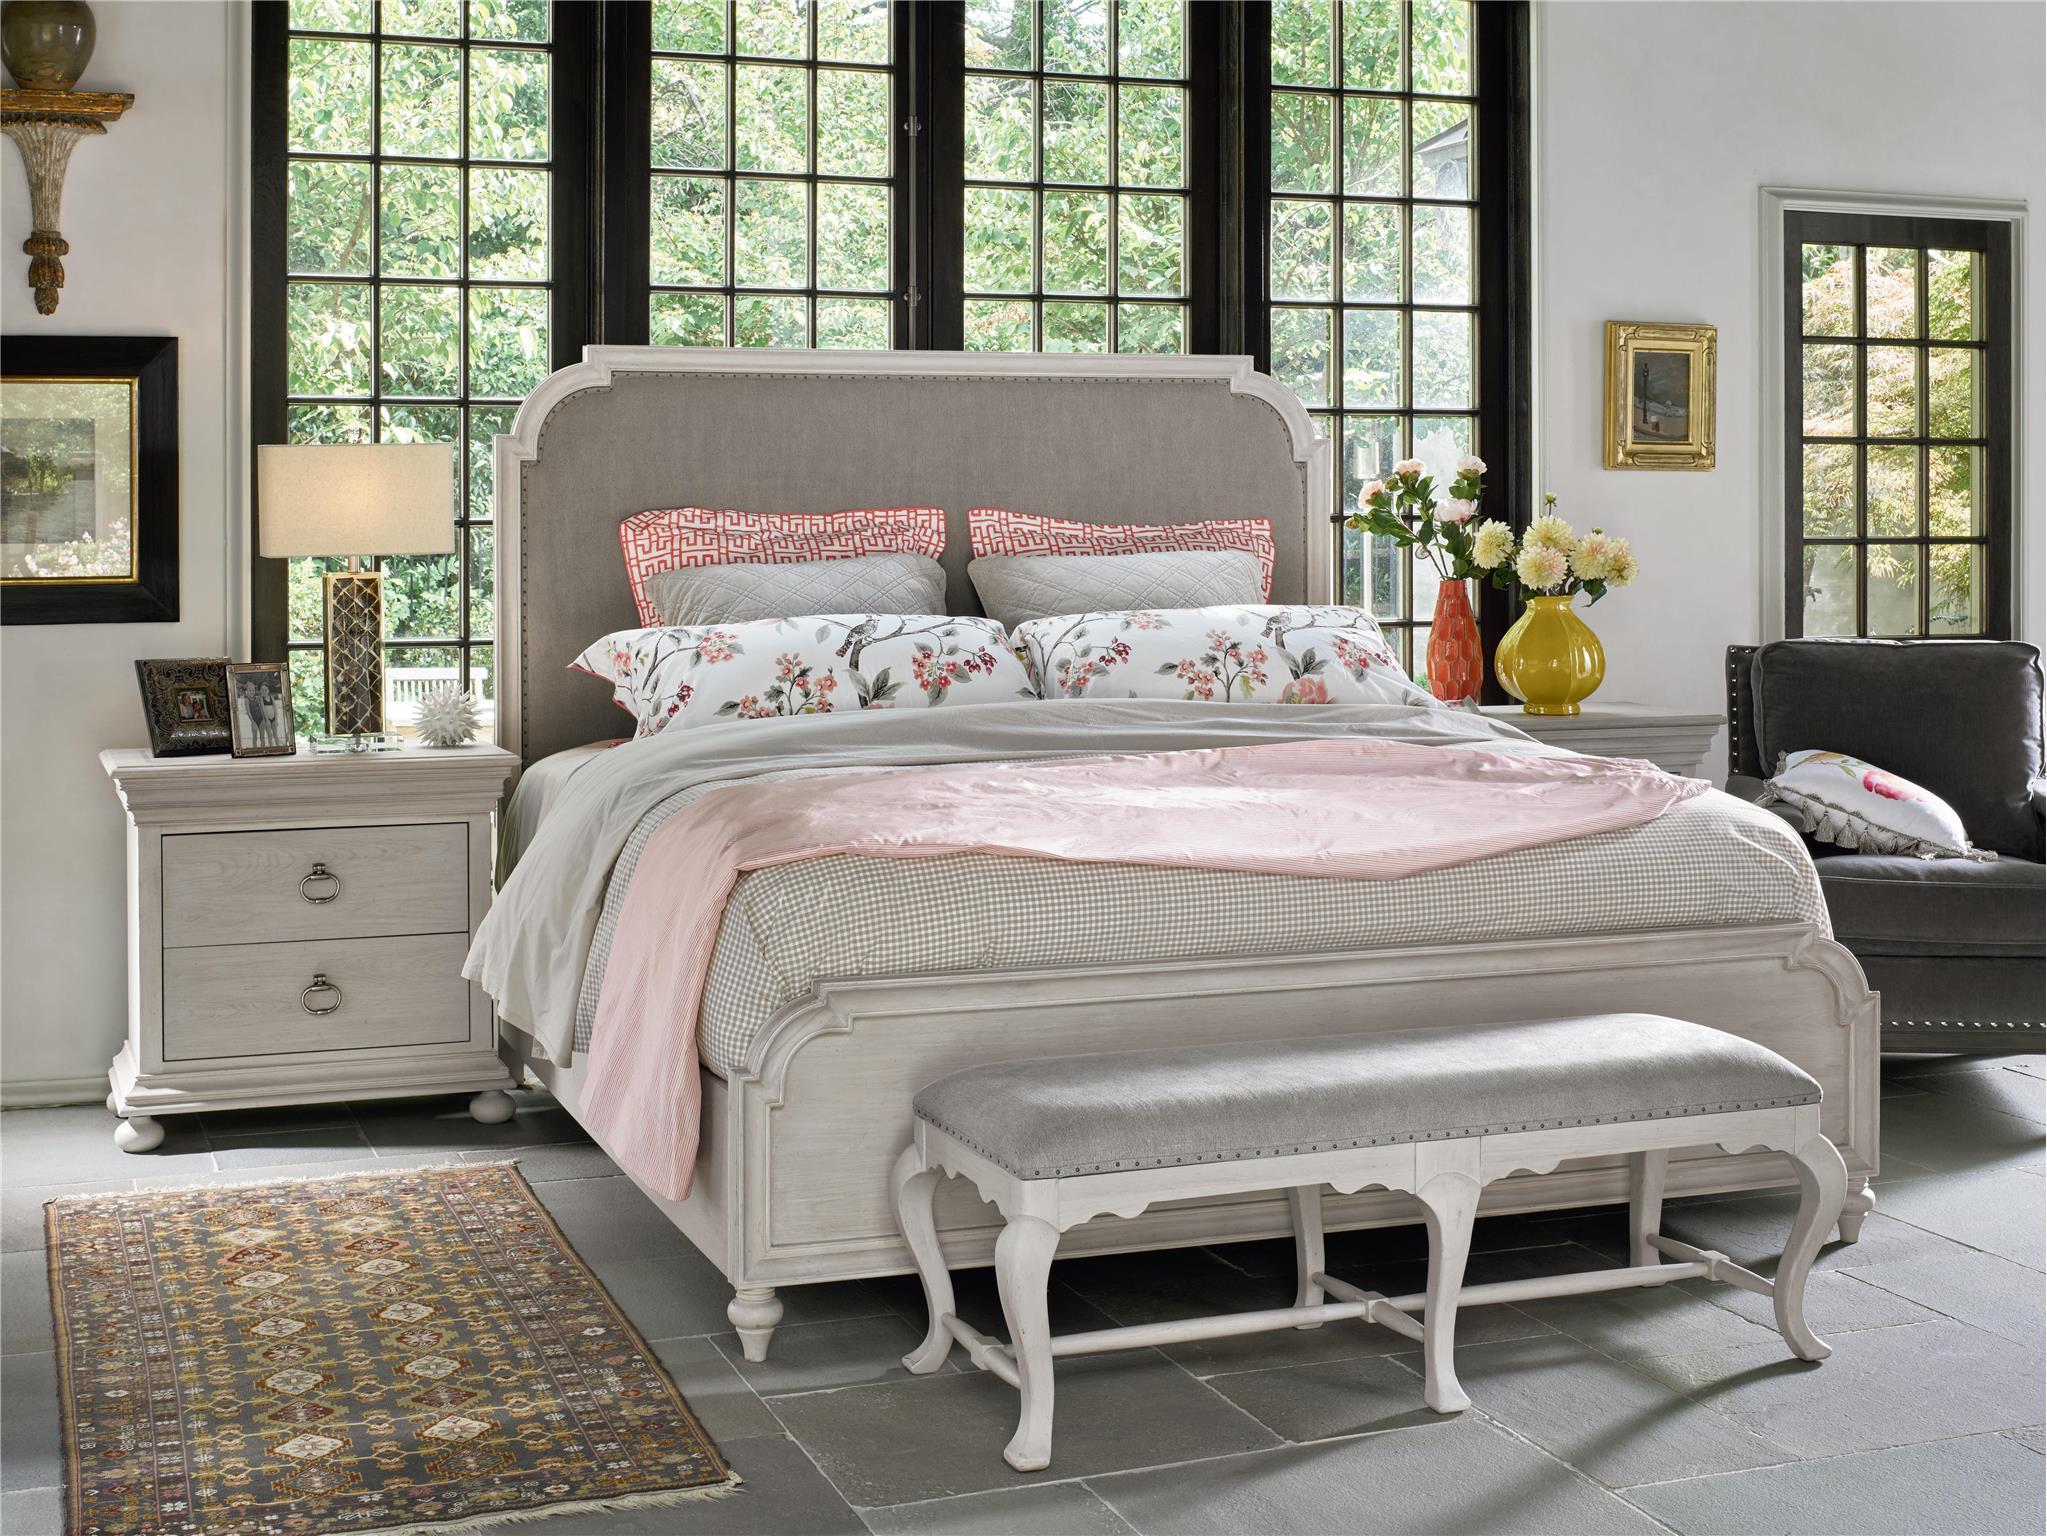 Belgian Country Style Bedroom Decor